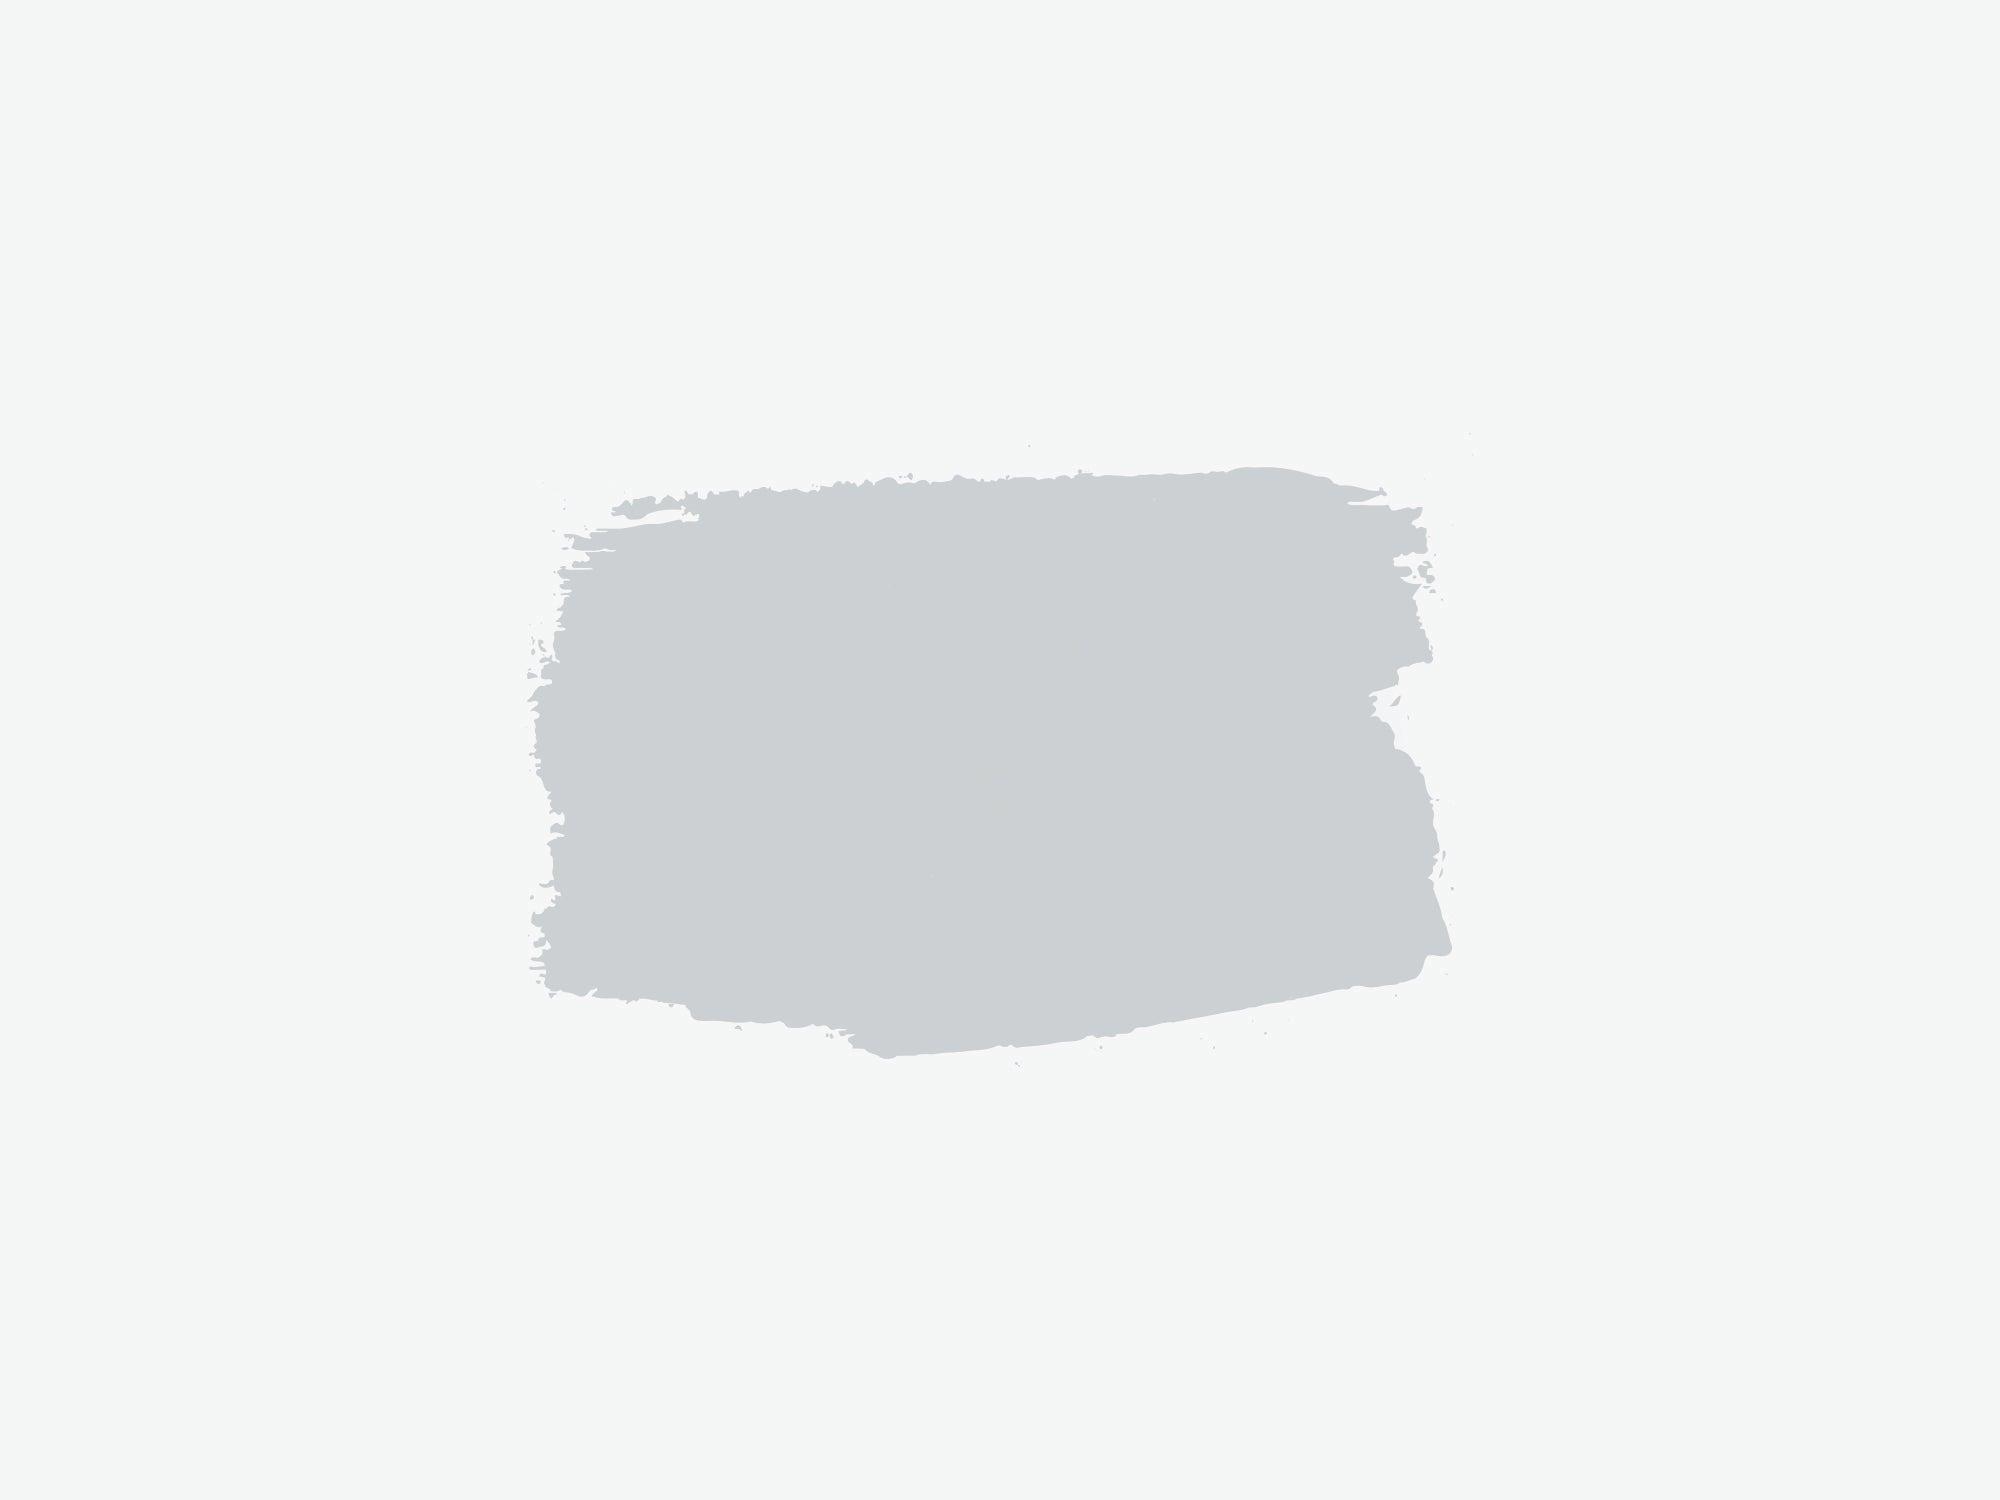 Paintswatch_Backdrop Gray